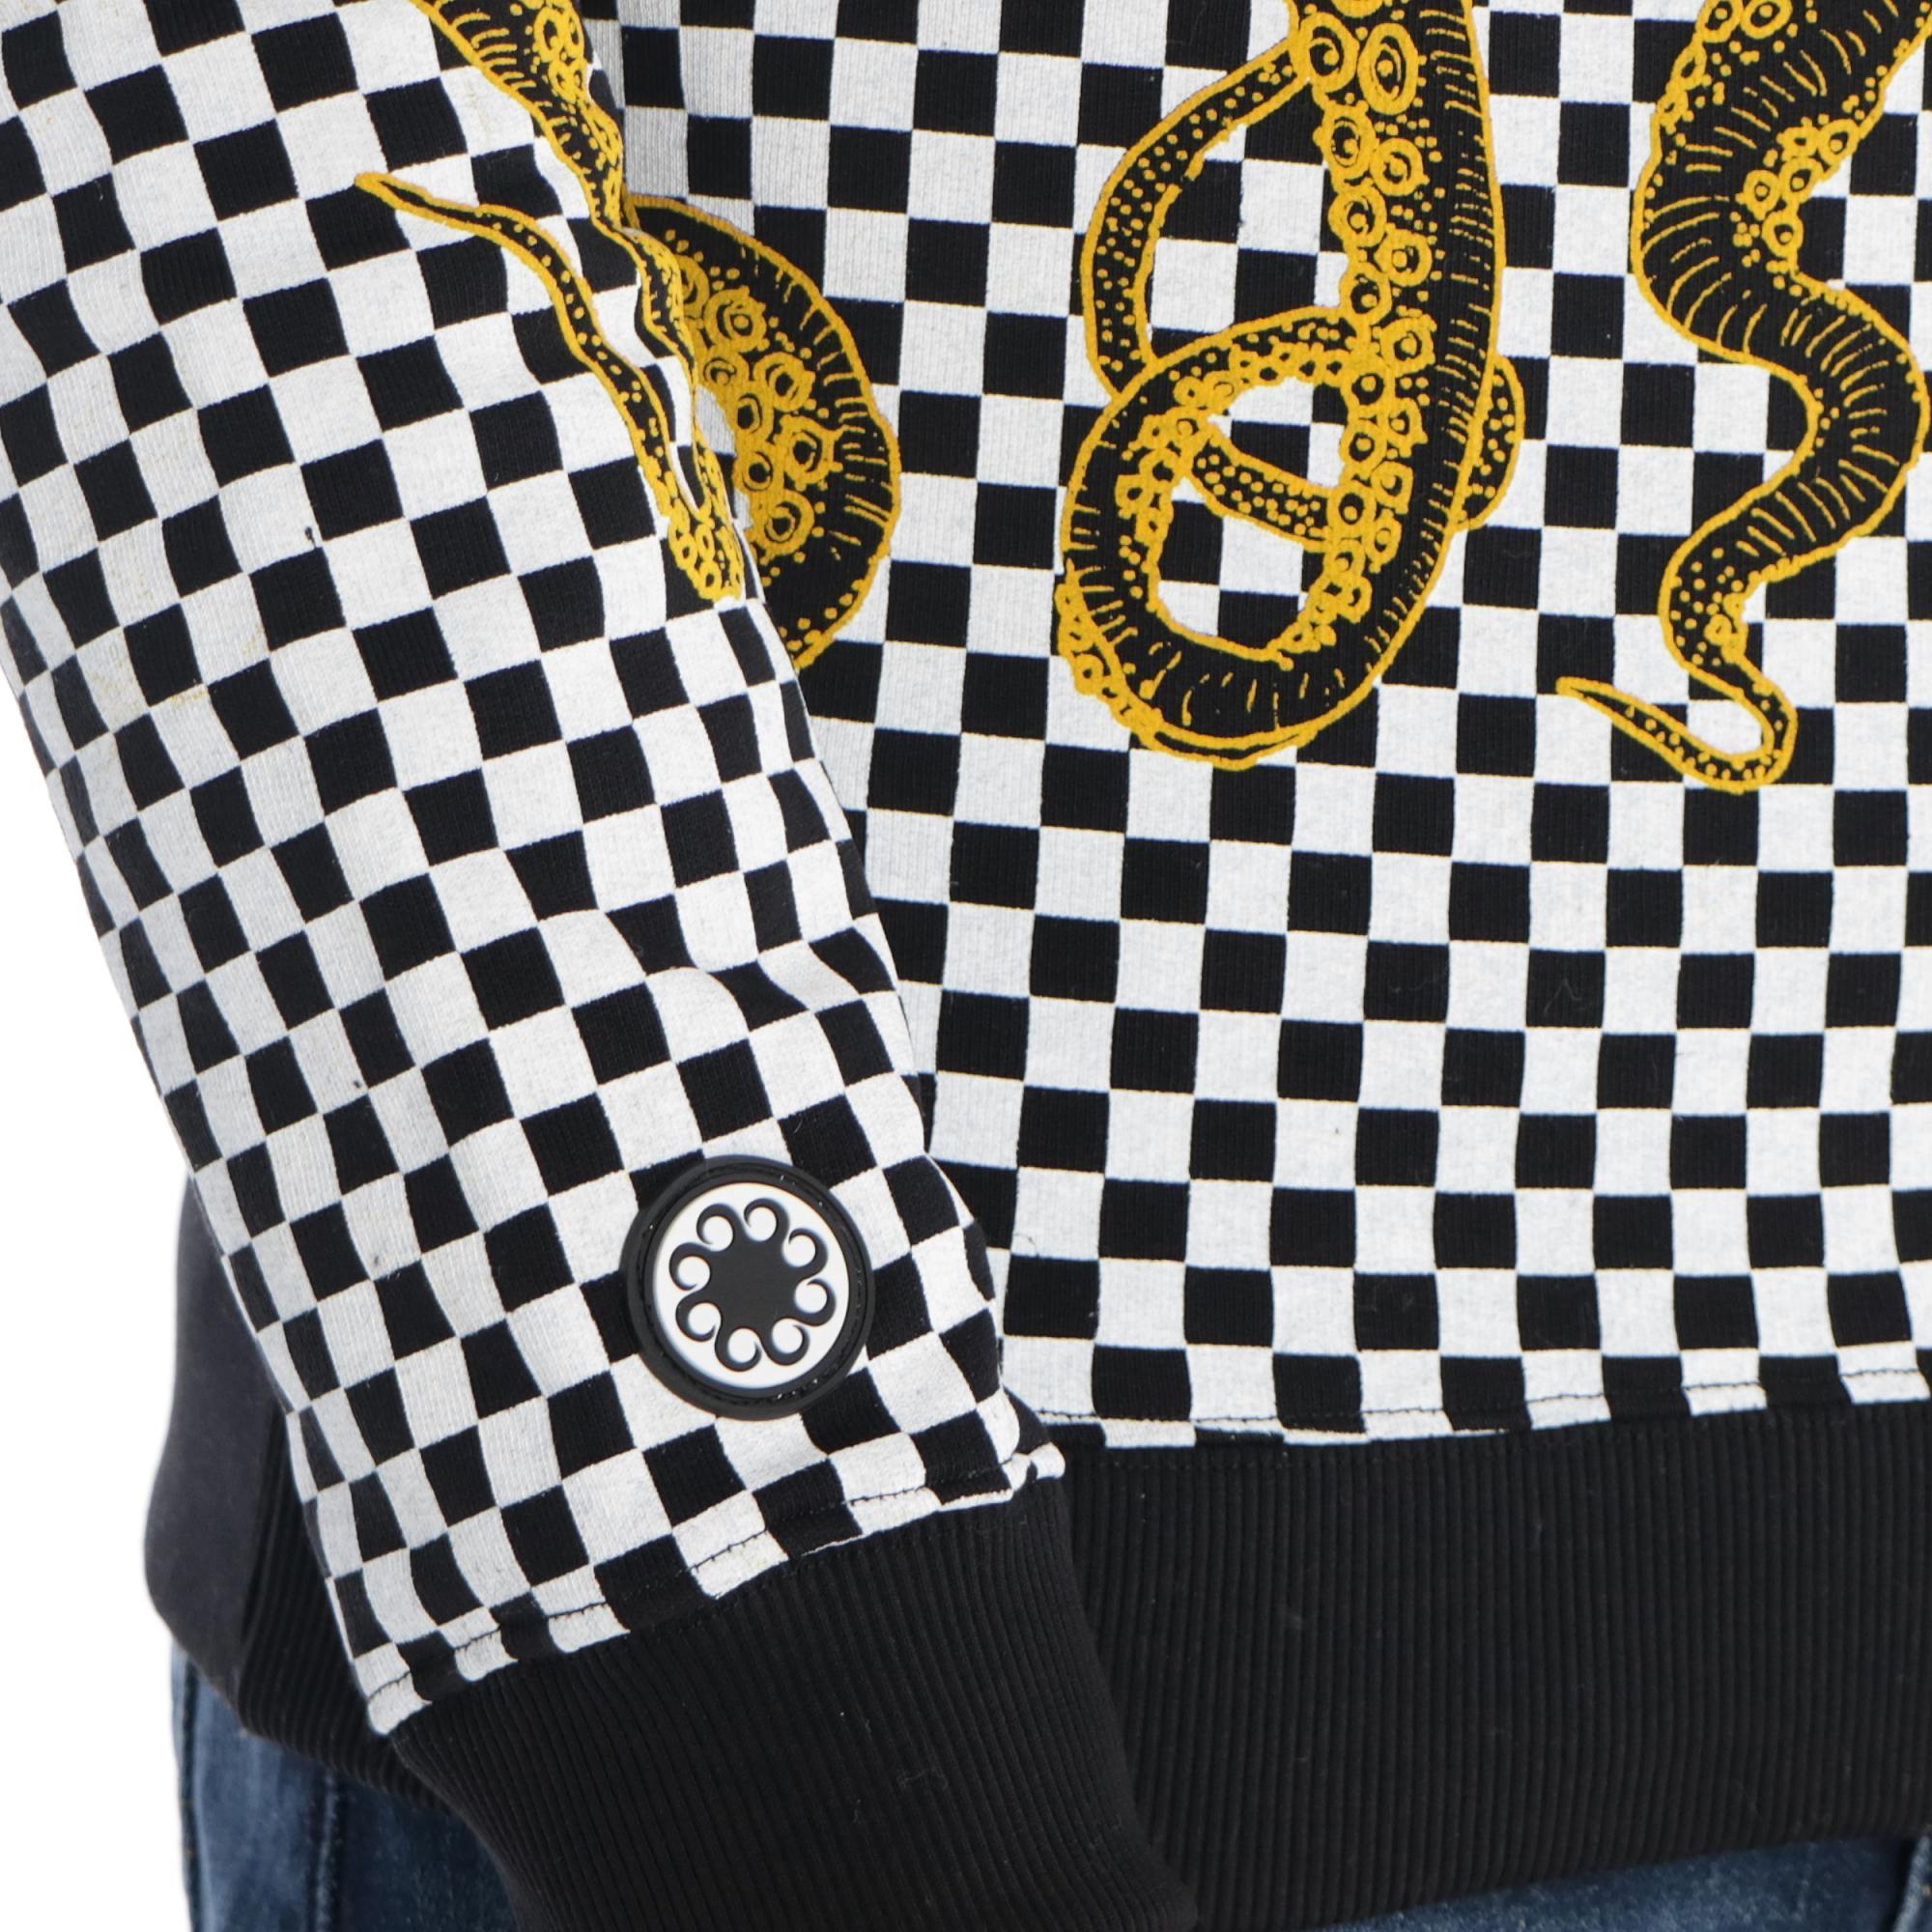 Octopus Checker Hoodie Black yellow